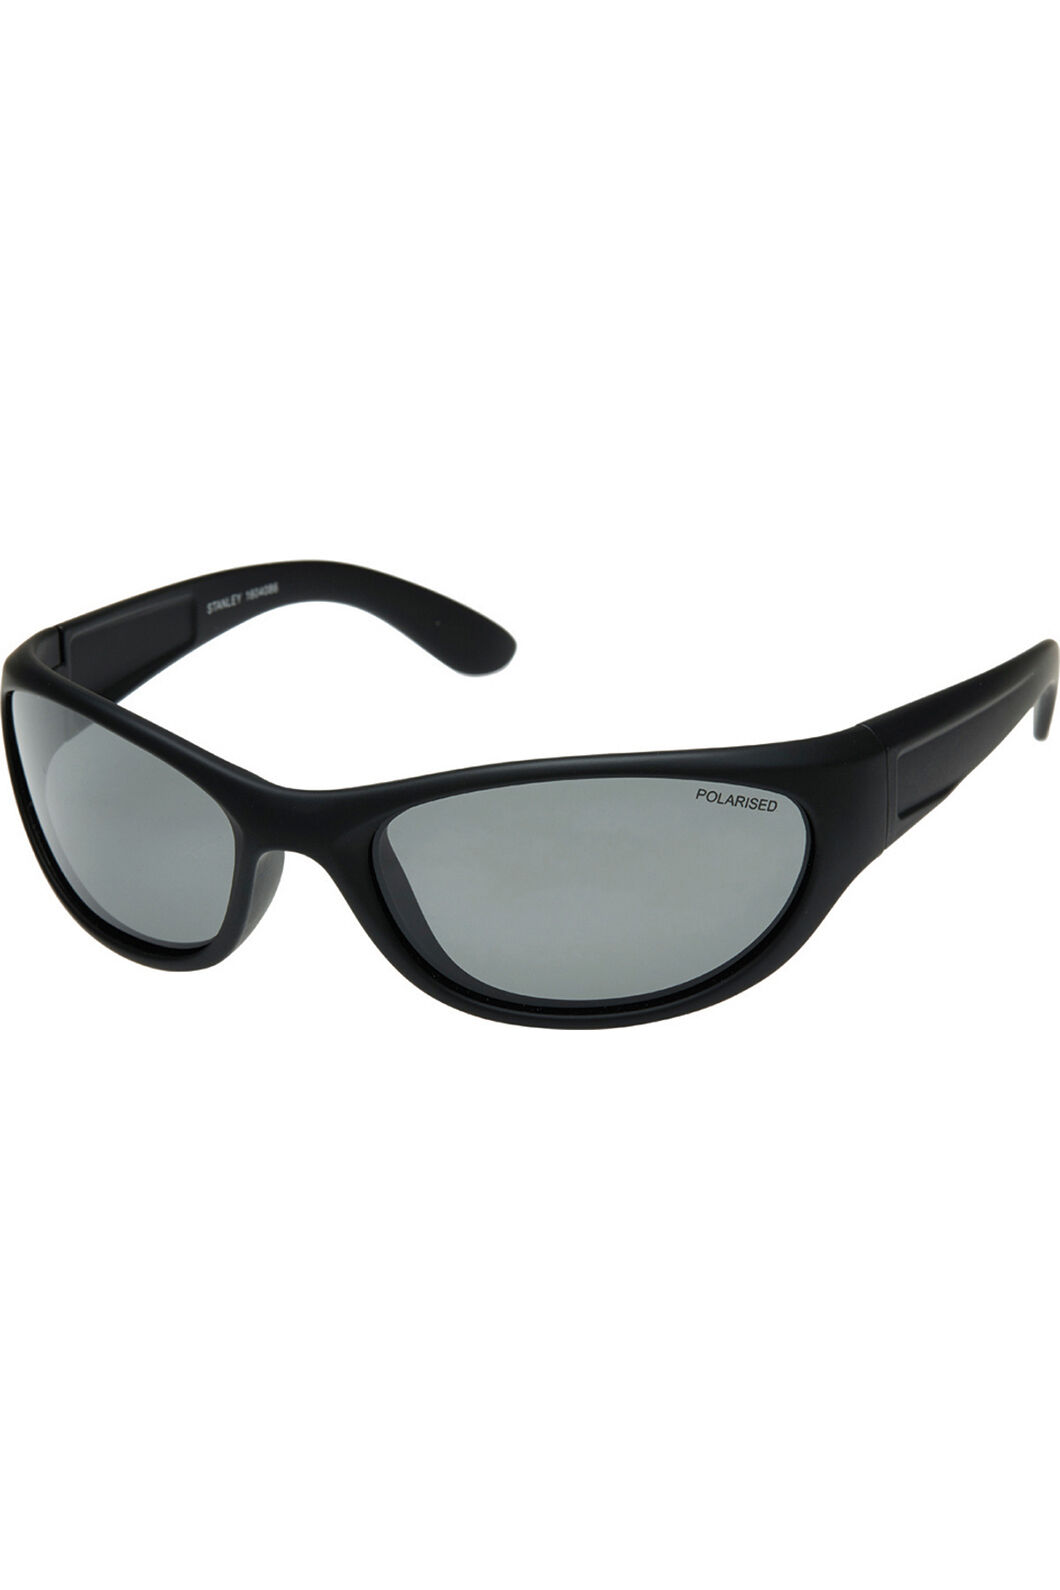 Cancer Council Men's Stanley Sunglasses, Black, hi-res